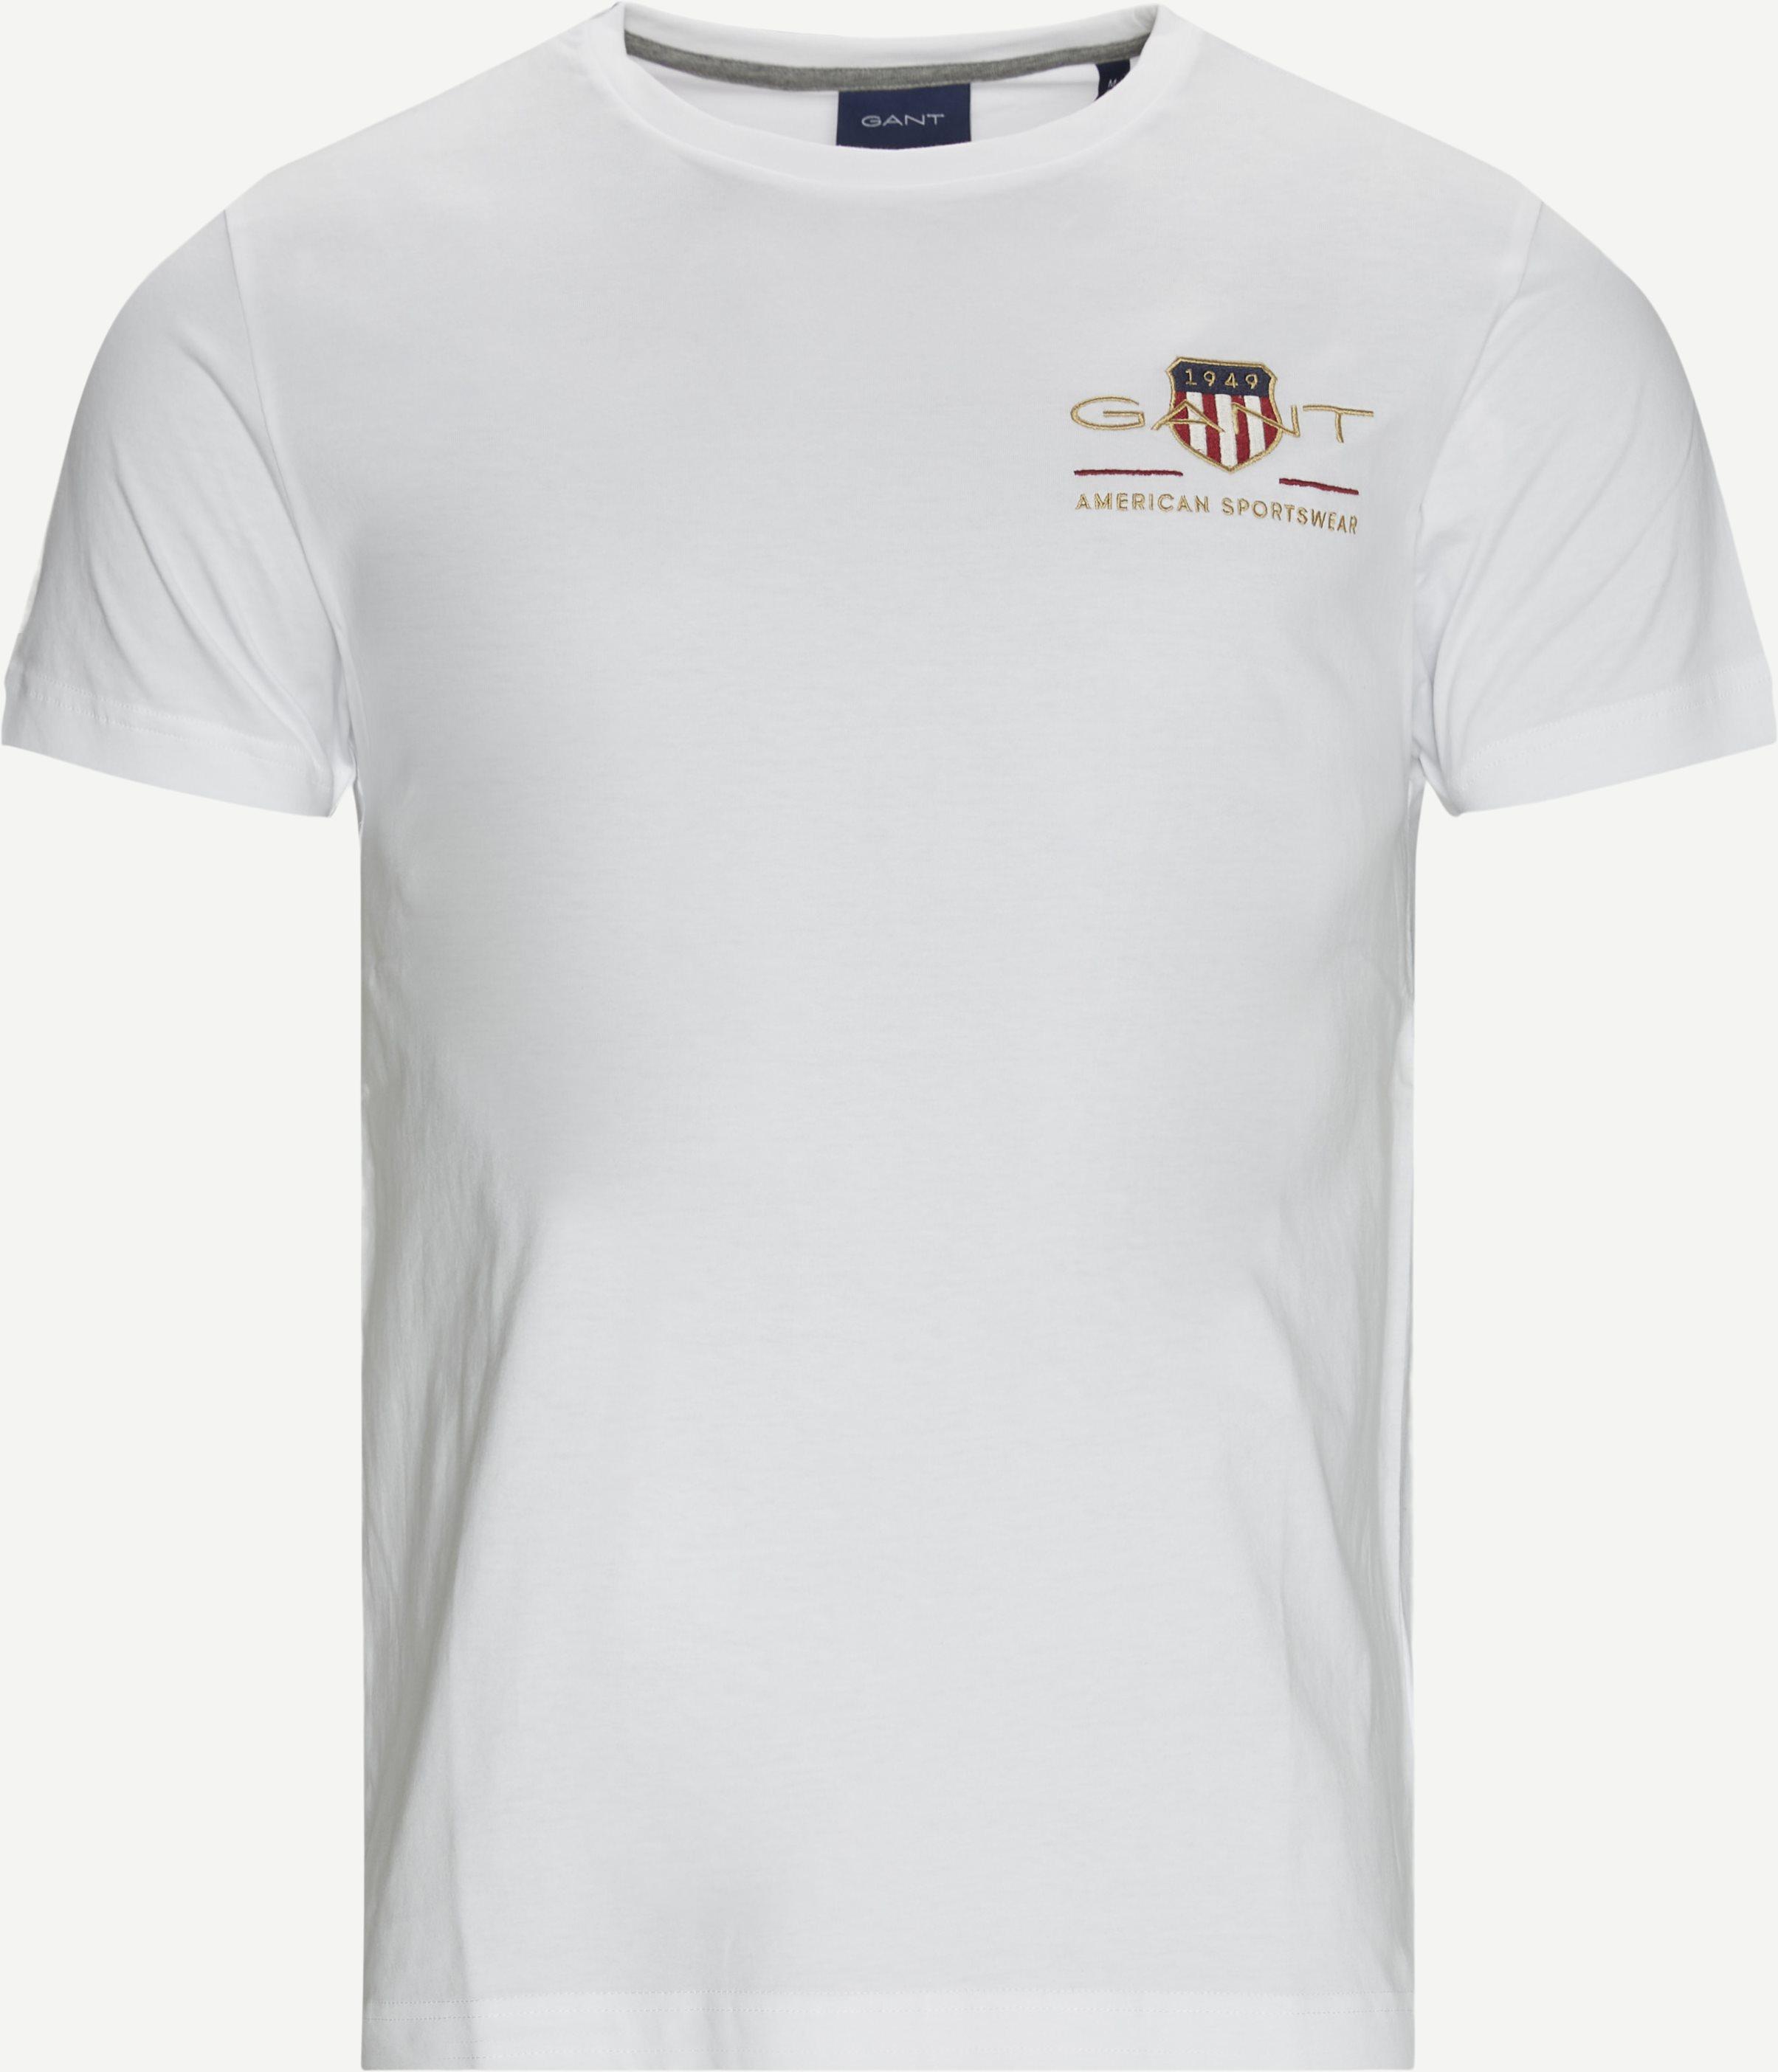 Shield Logo Tee - T-shirts - Regular fit - Hvid